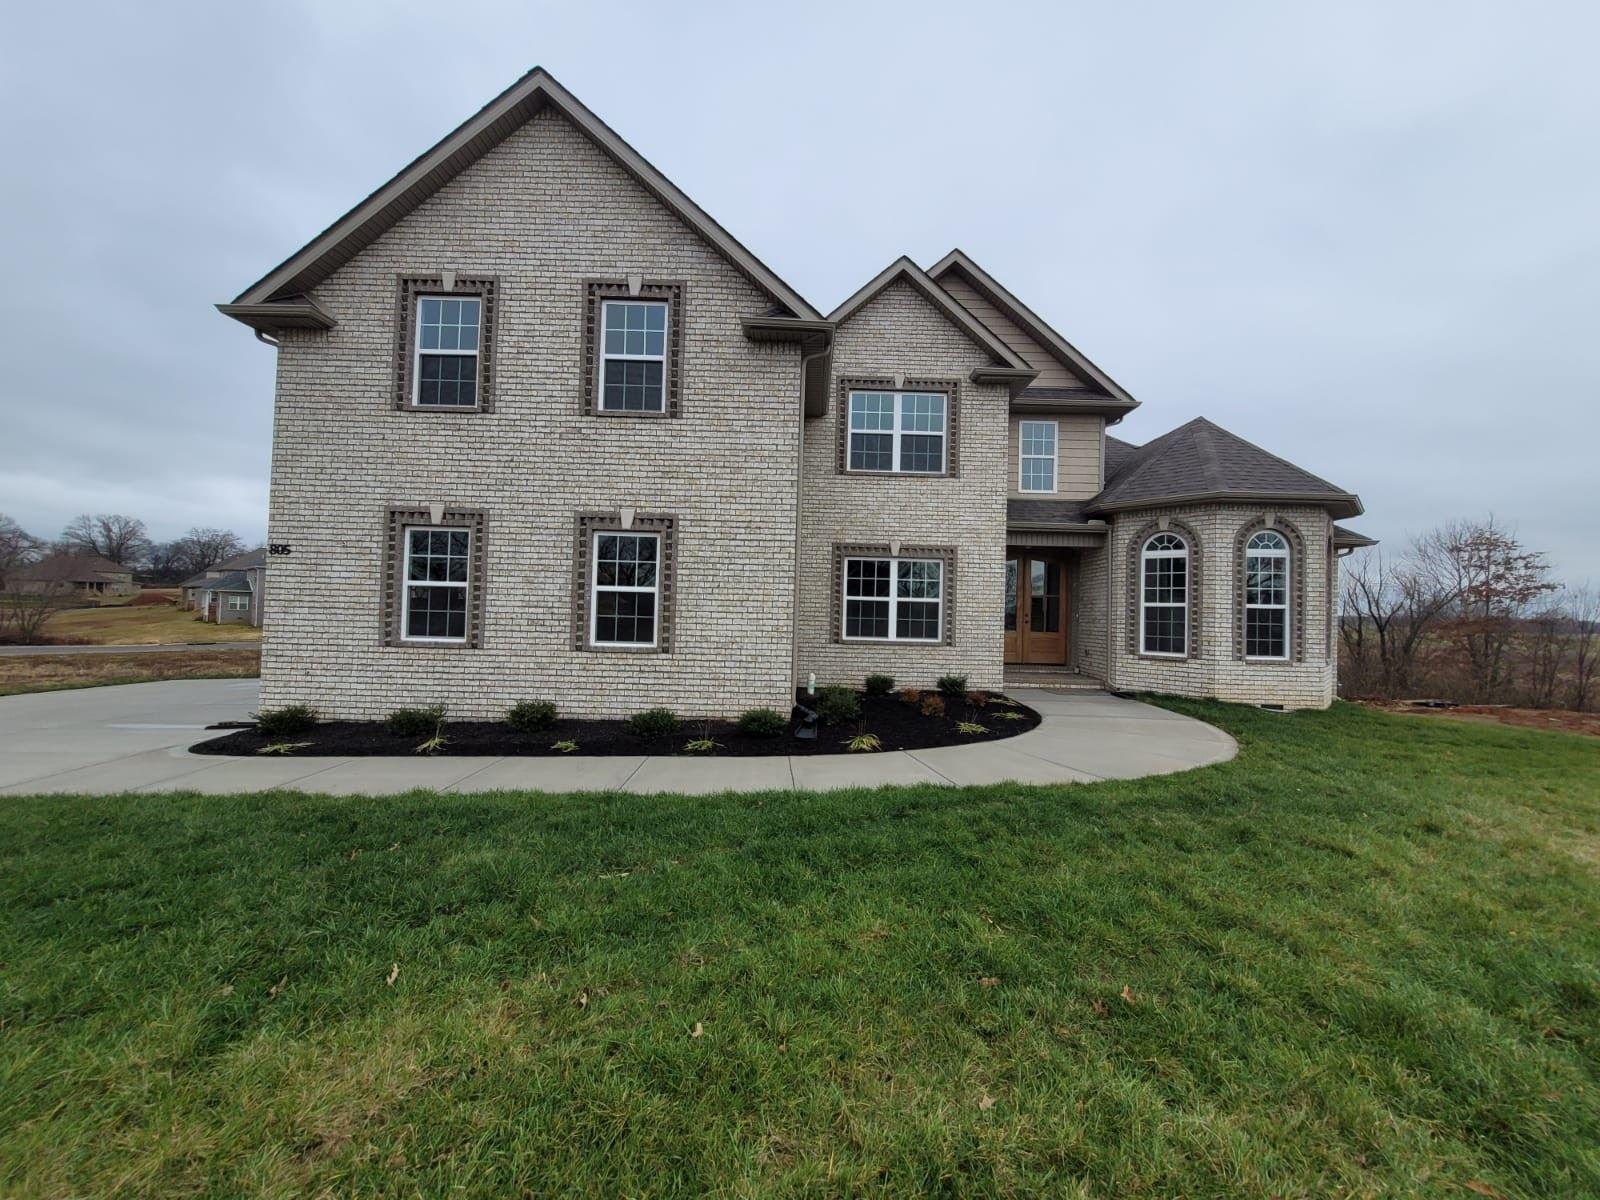 116 Hartley Hills, Clarksville, TN 37043 - MLS#: 2244224